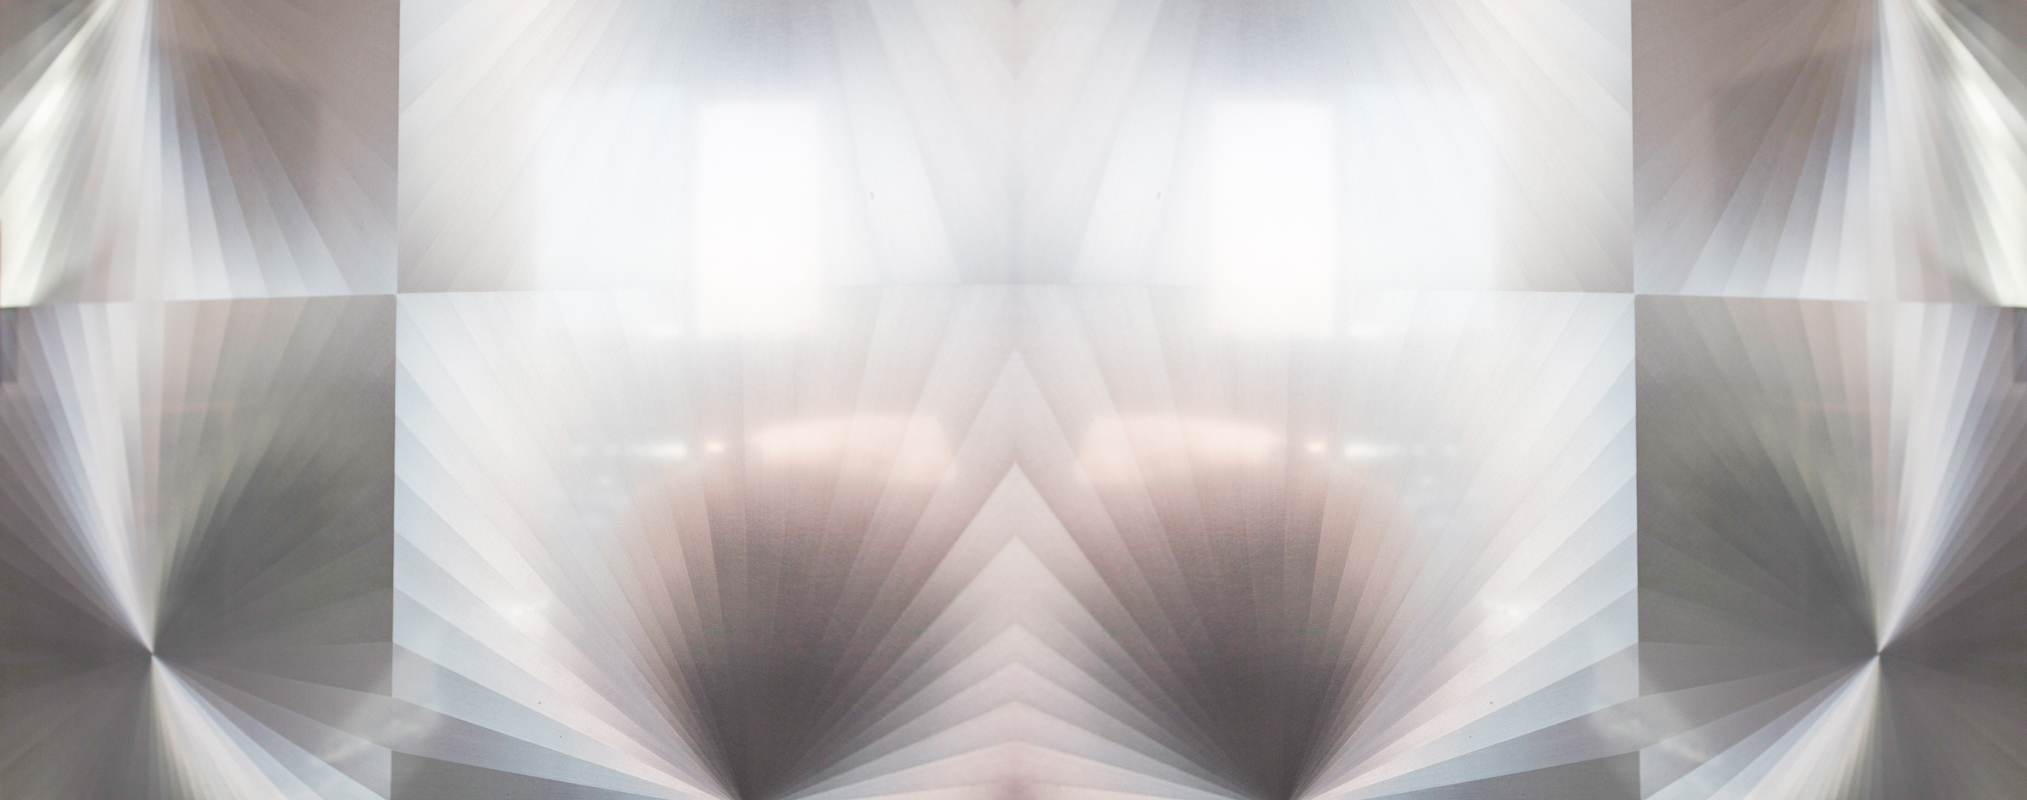 Armoire_header